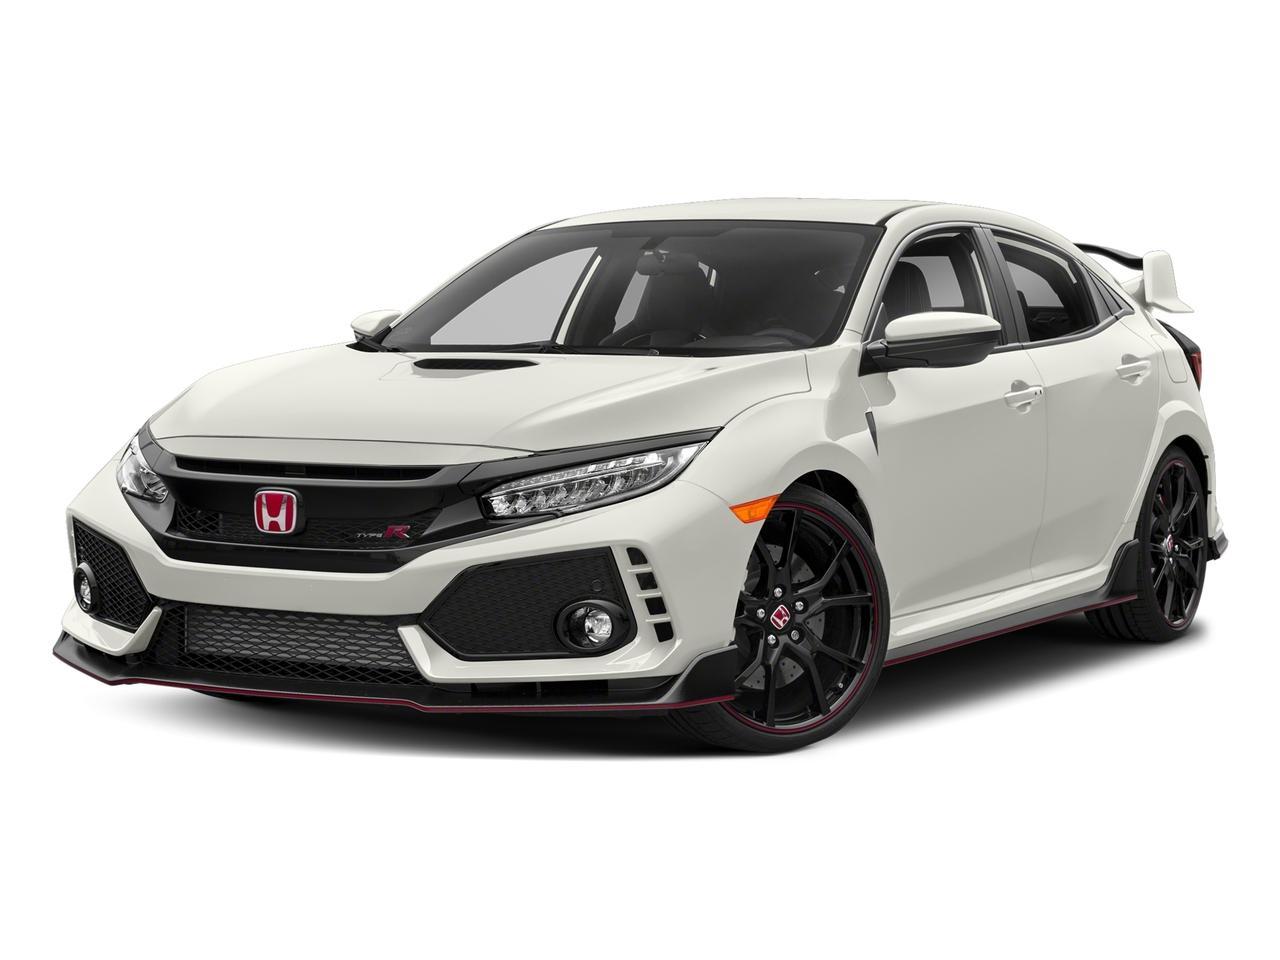 2018 Honda Civic Type R Vehicle Photo in San Antonio, TX 78238